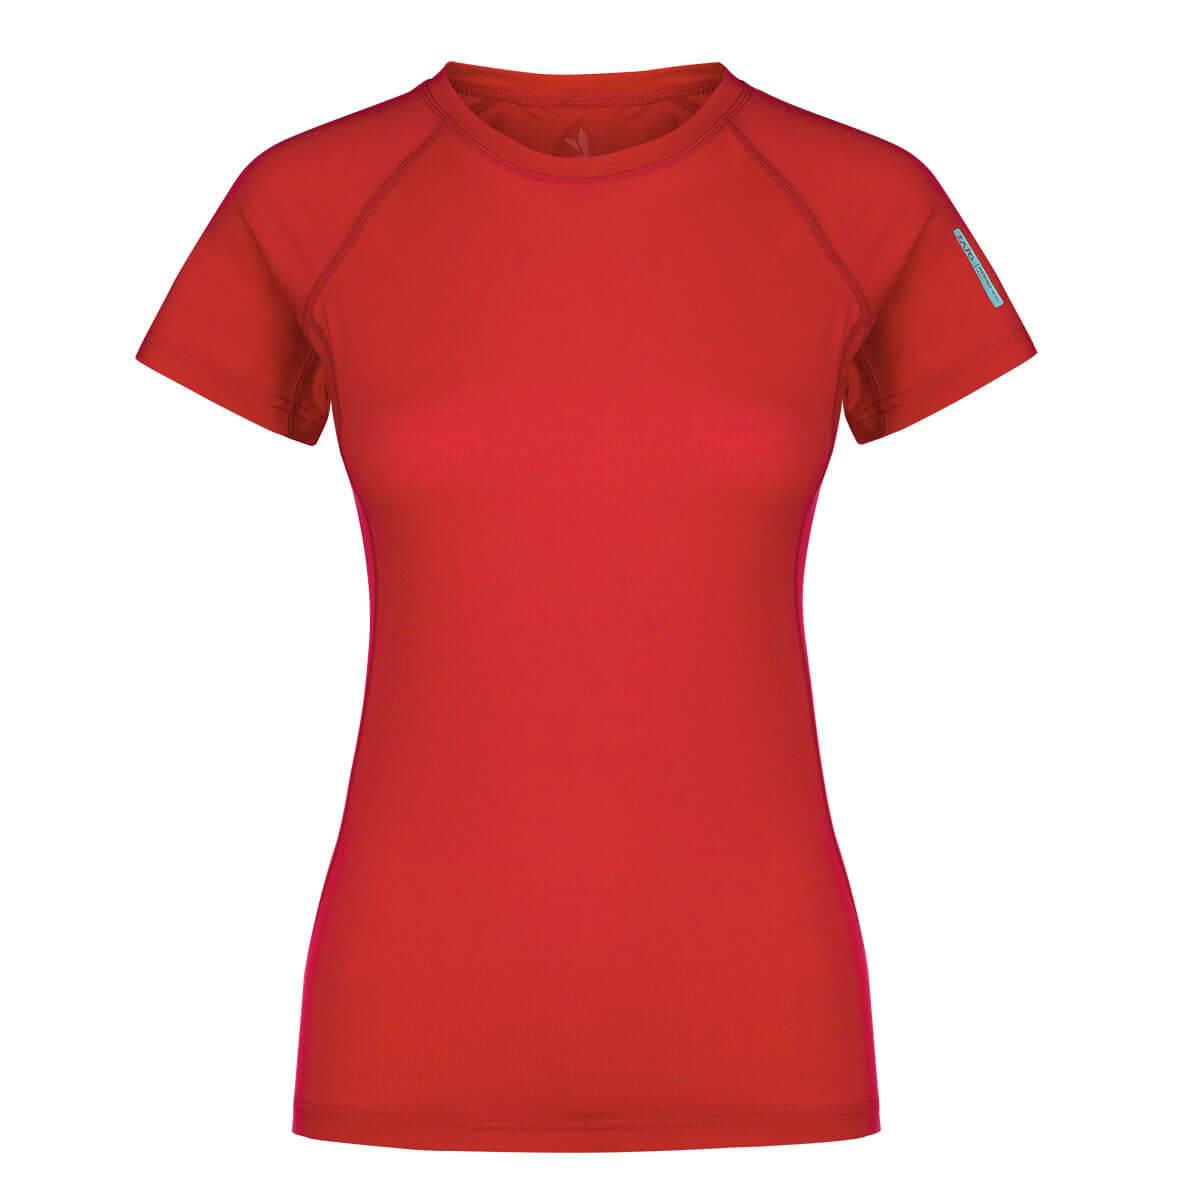 Dámske tričko Zajo Elsa Merino Nylon T-shirt SS Racing Red - veľkosť XS